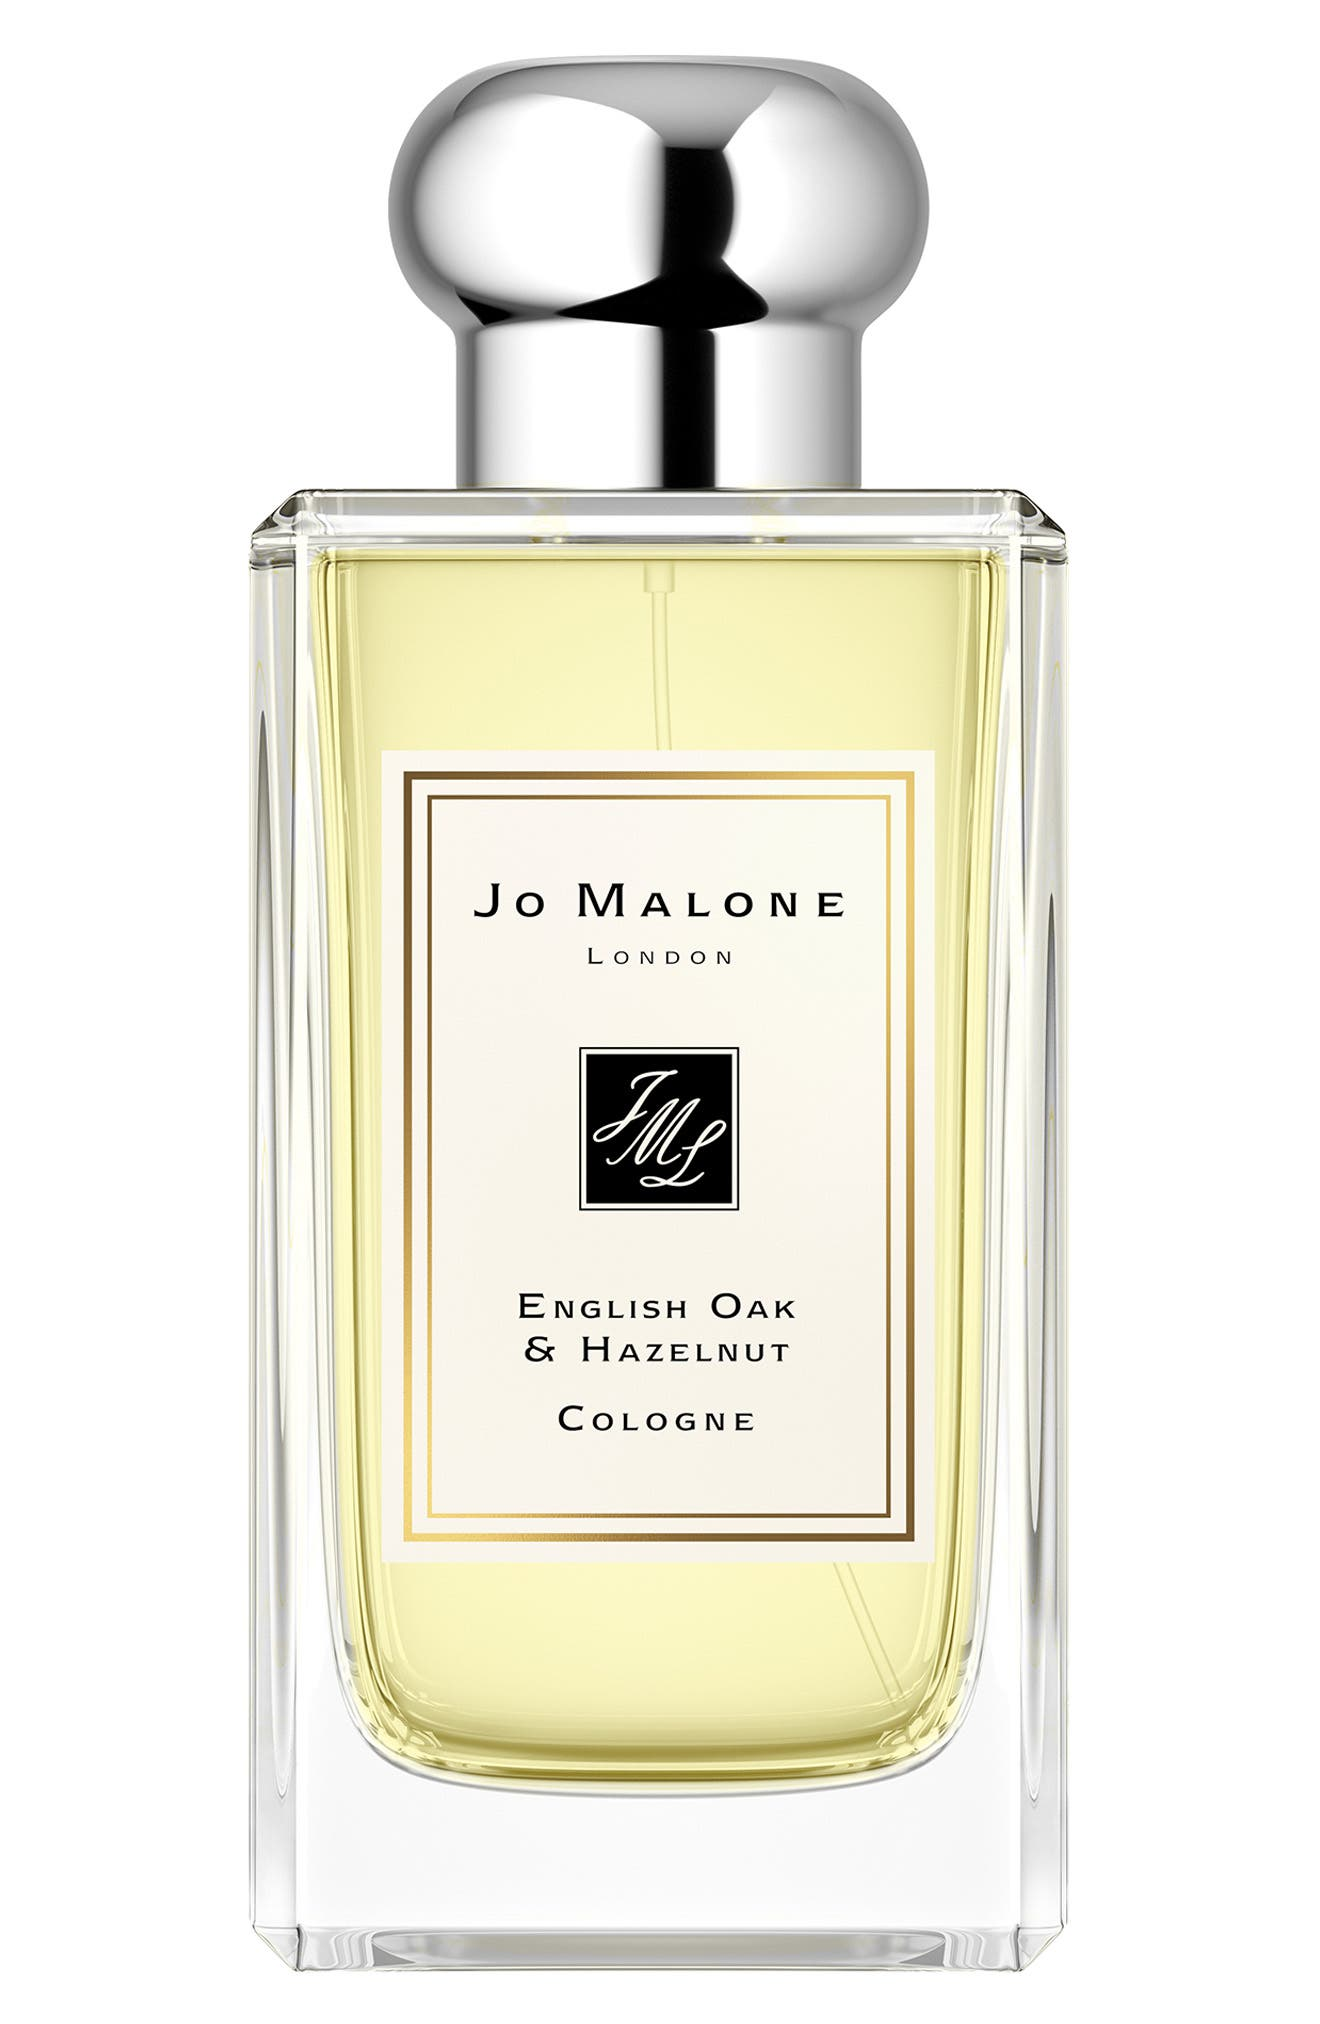 Jo Malone London(TM) English Oak & Hazelnut Cologne